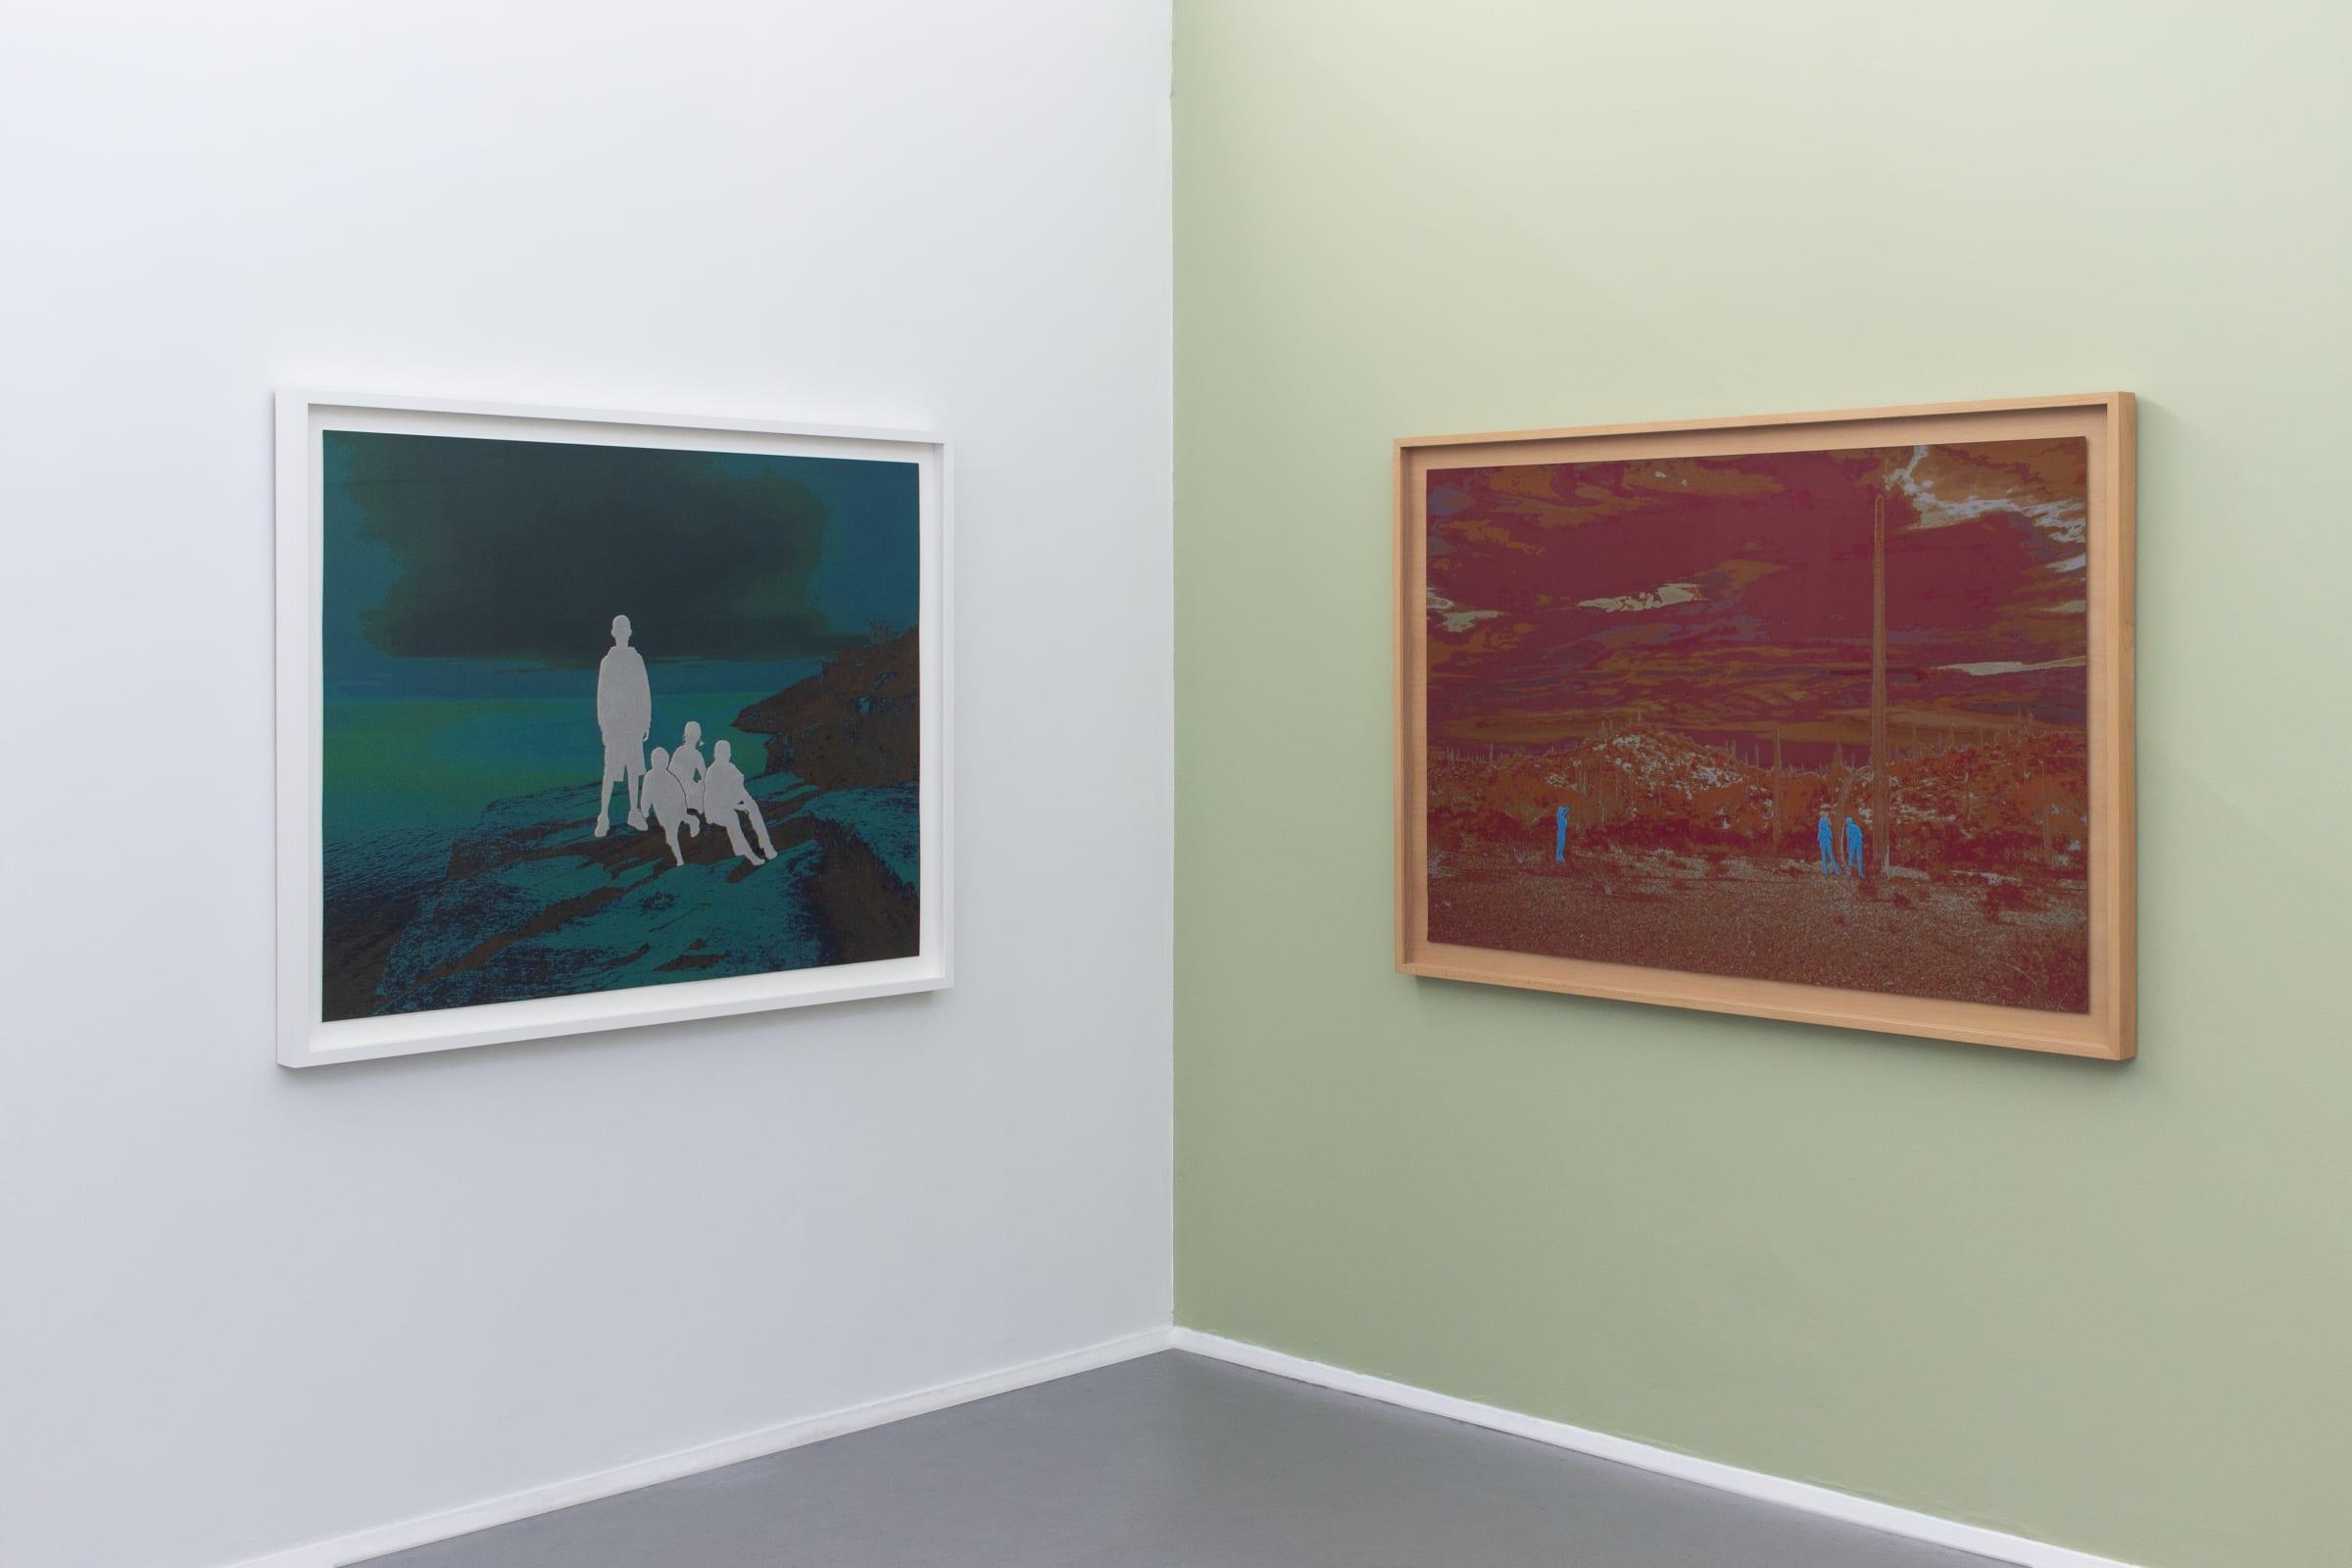 John Brinton Hogan, Gallery Director Making Snapshot of Artists ...